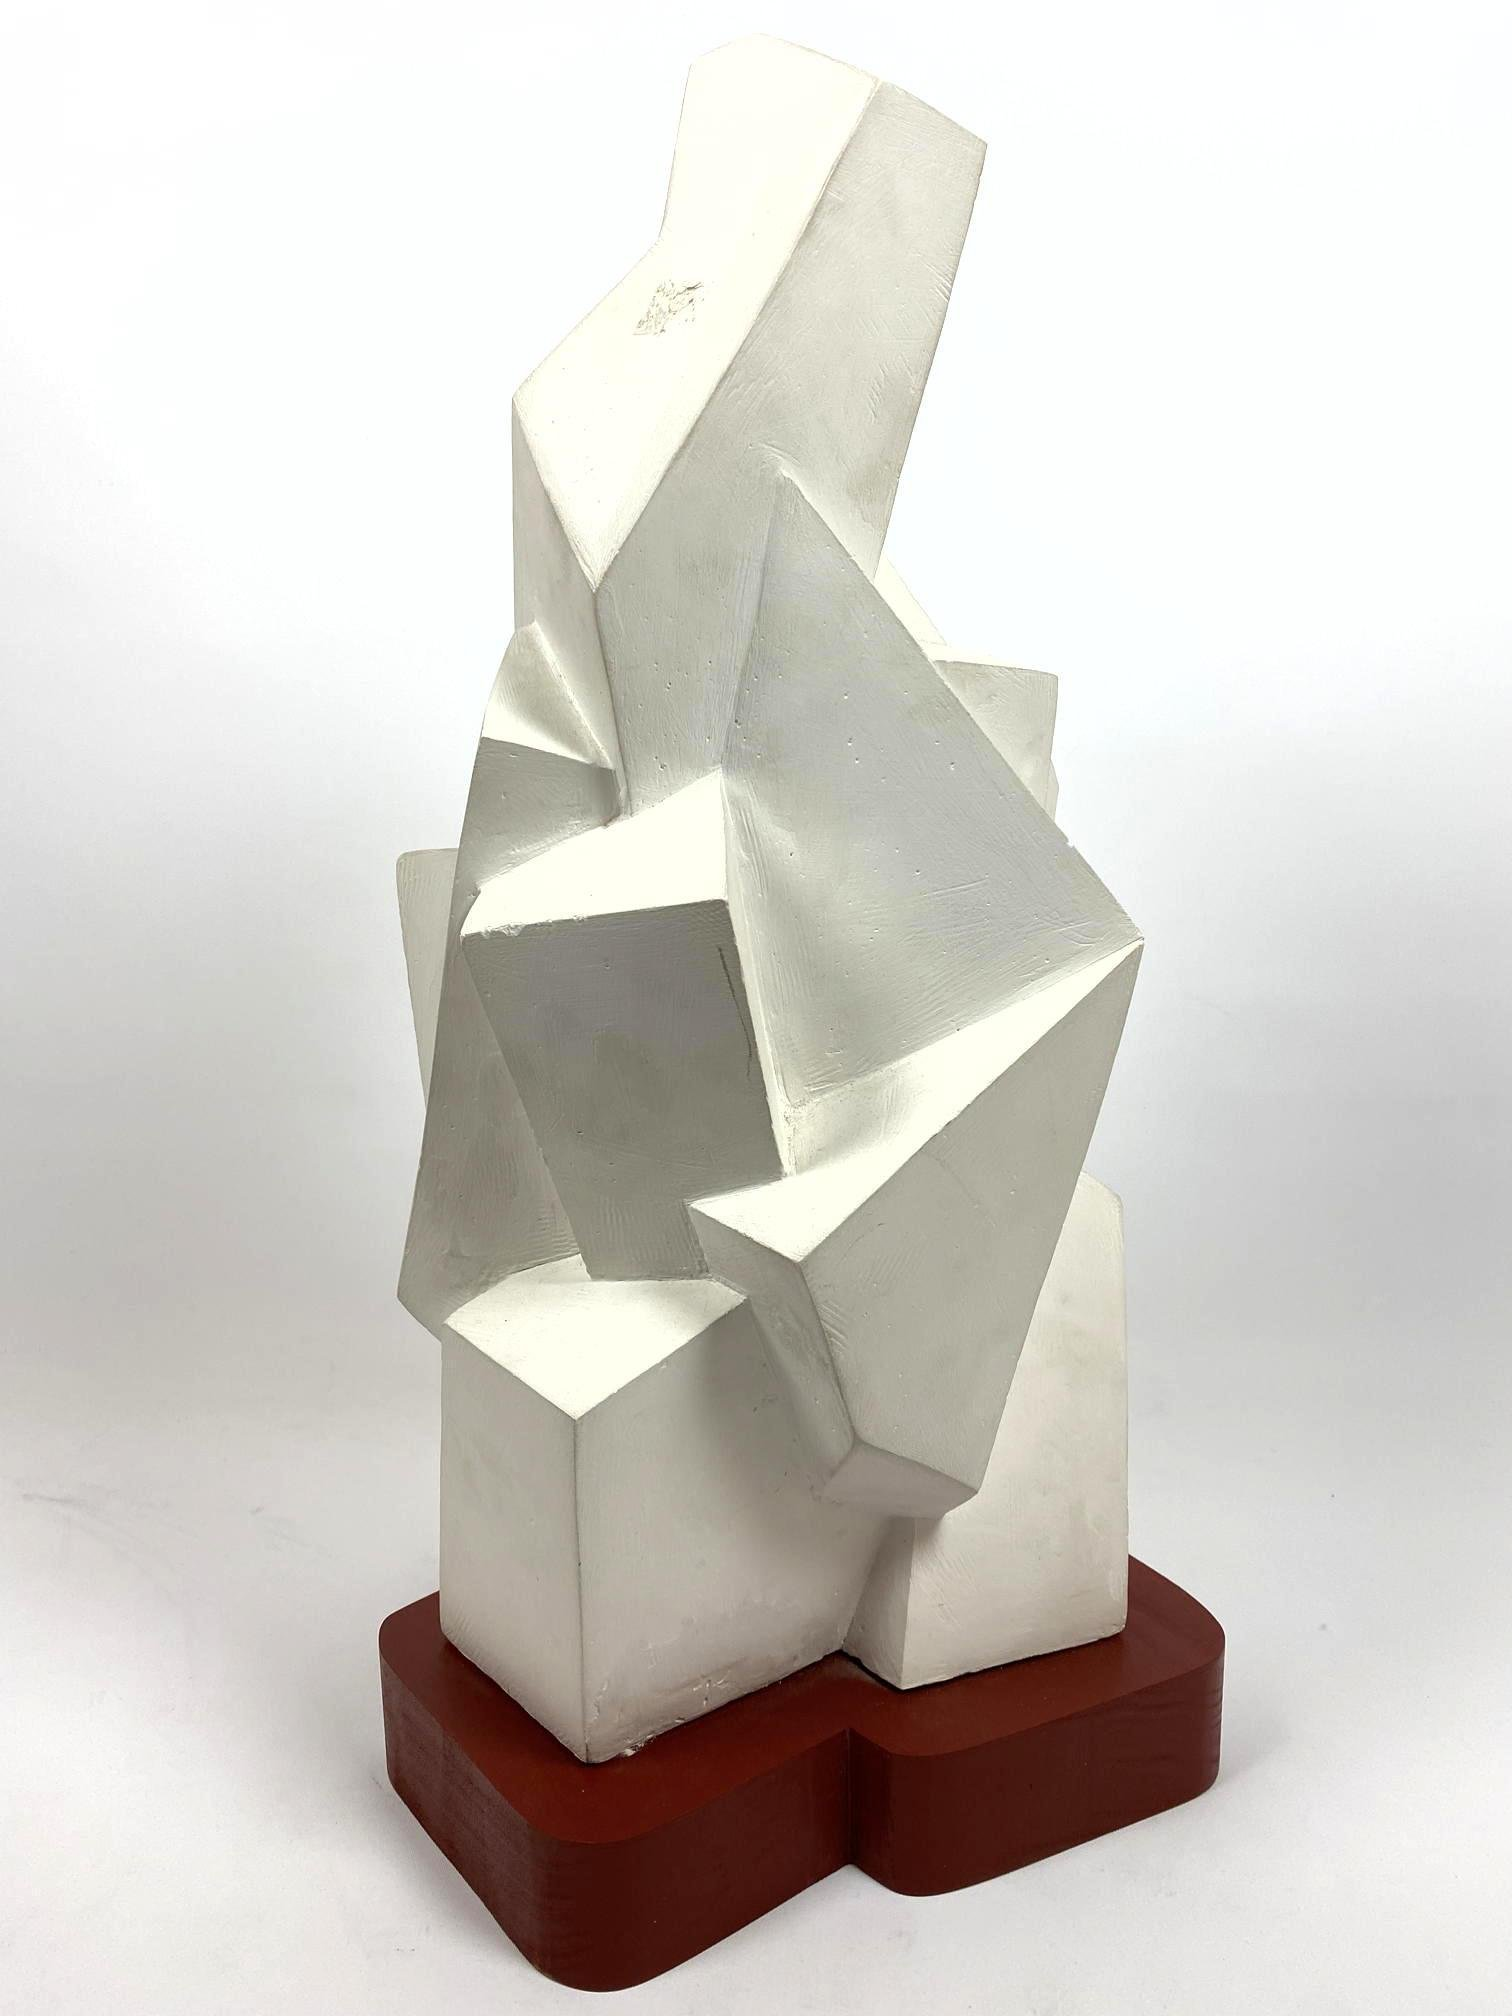 Futurist Painted Wood & Plaster Modernist Sculpture. Ca